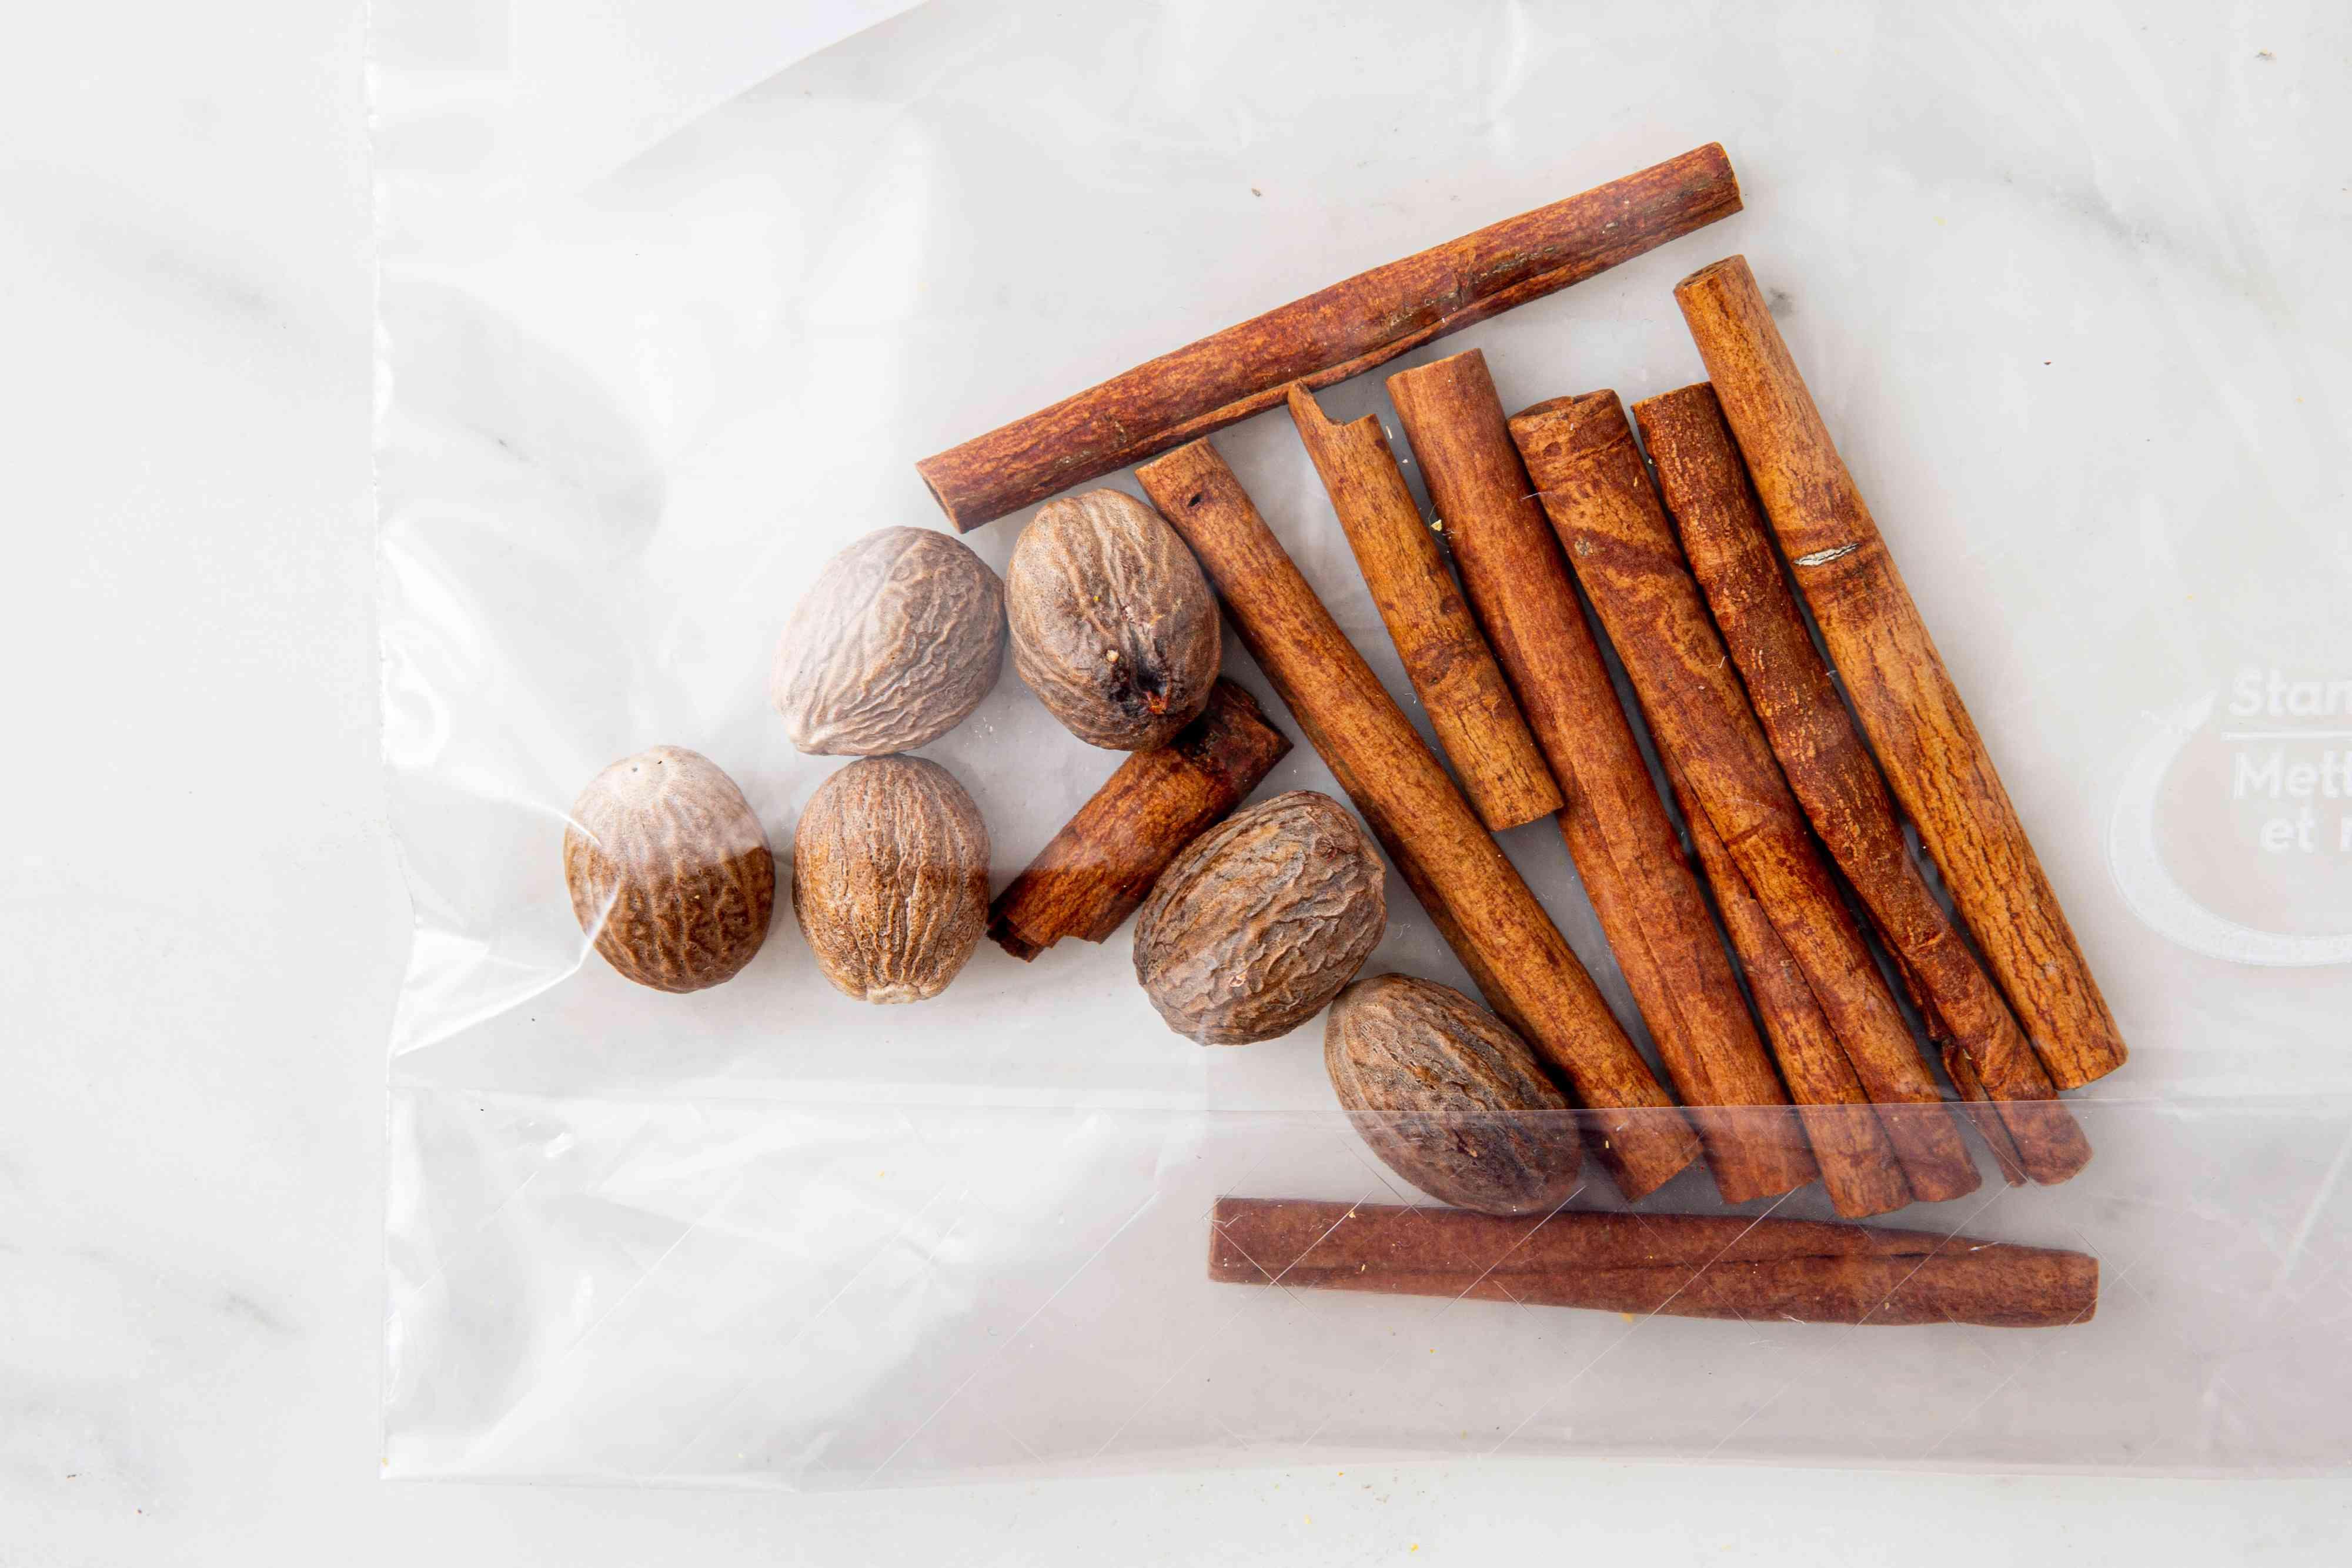 cinnamon sticks and nutmeg in a heavy-duty freezer bag